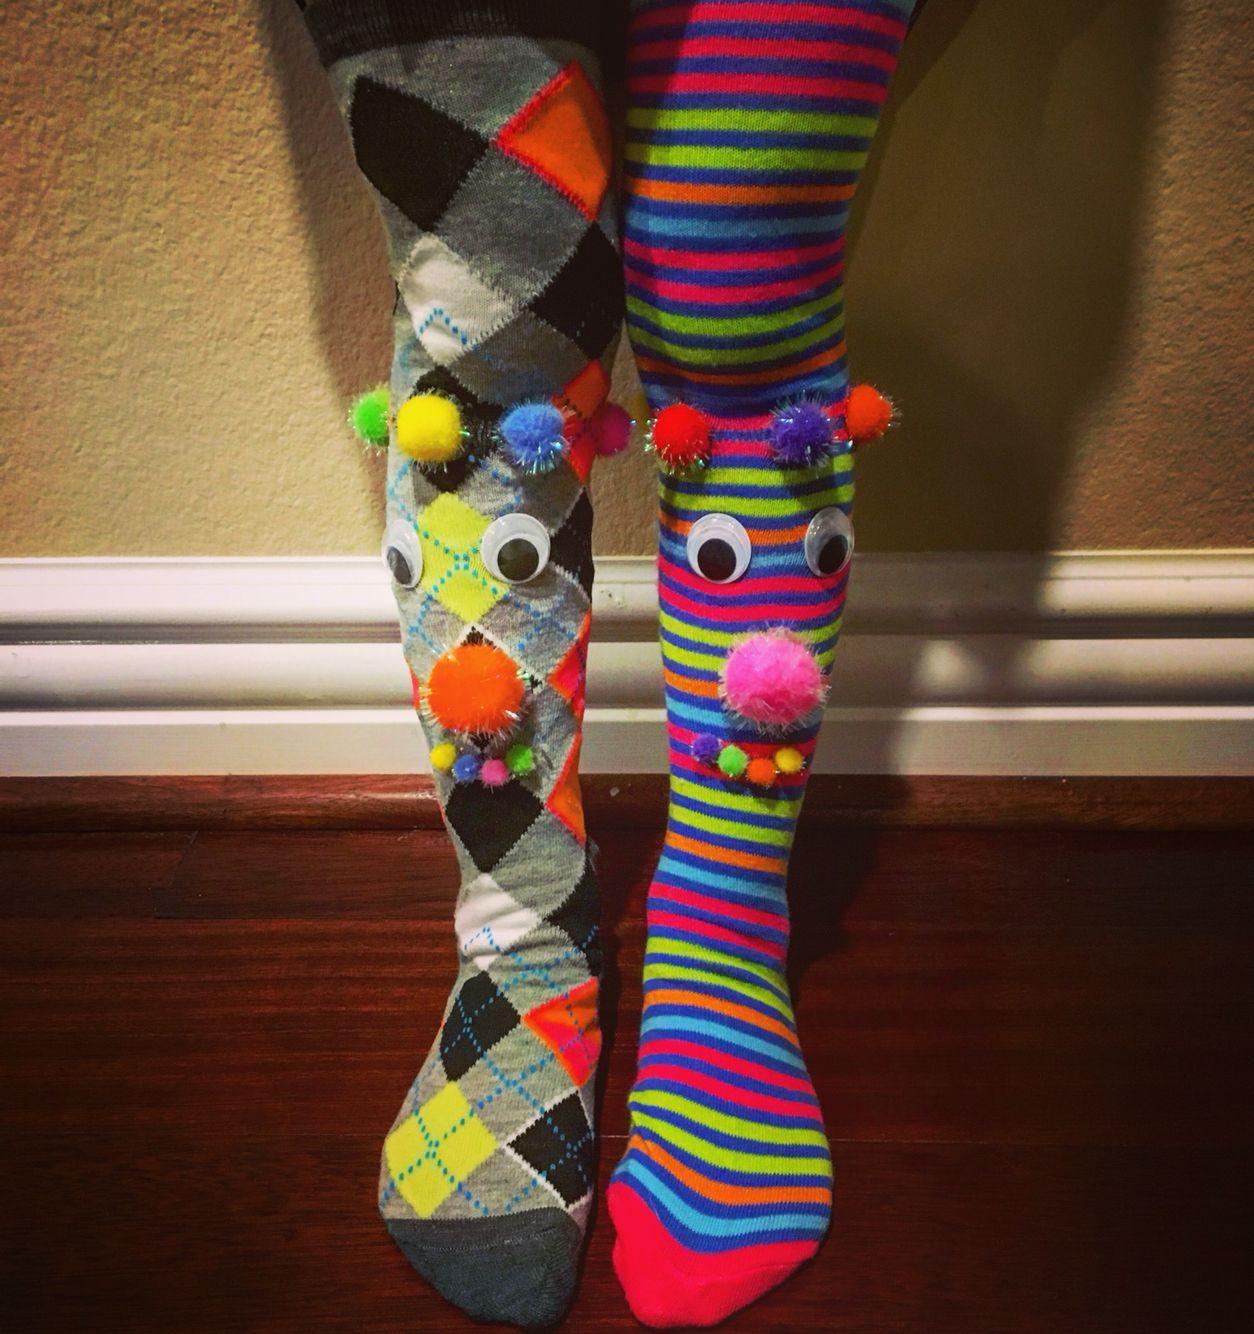 Crazy Sock Day Arts And Crafts Crazy Socks Wacky